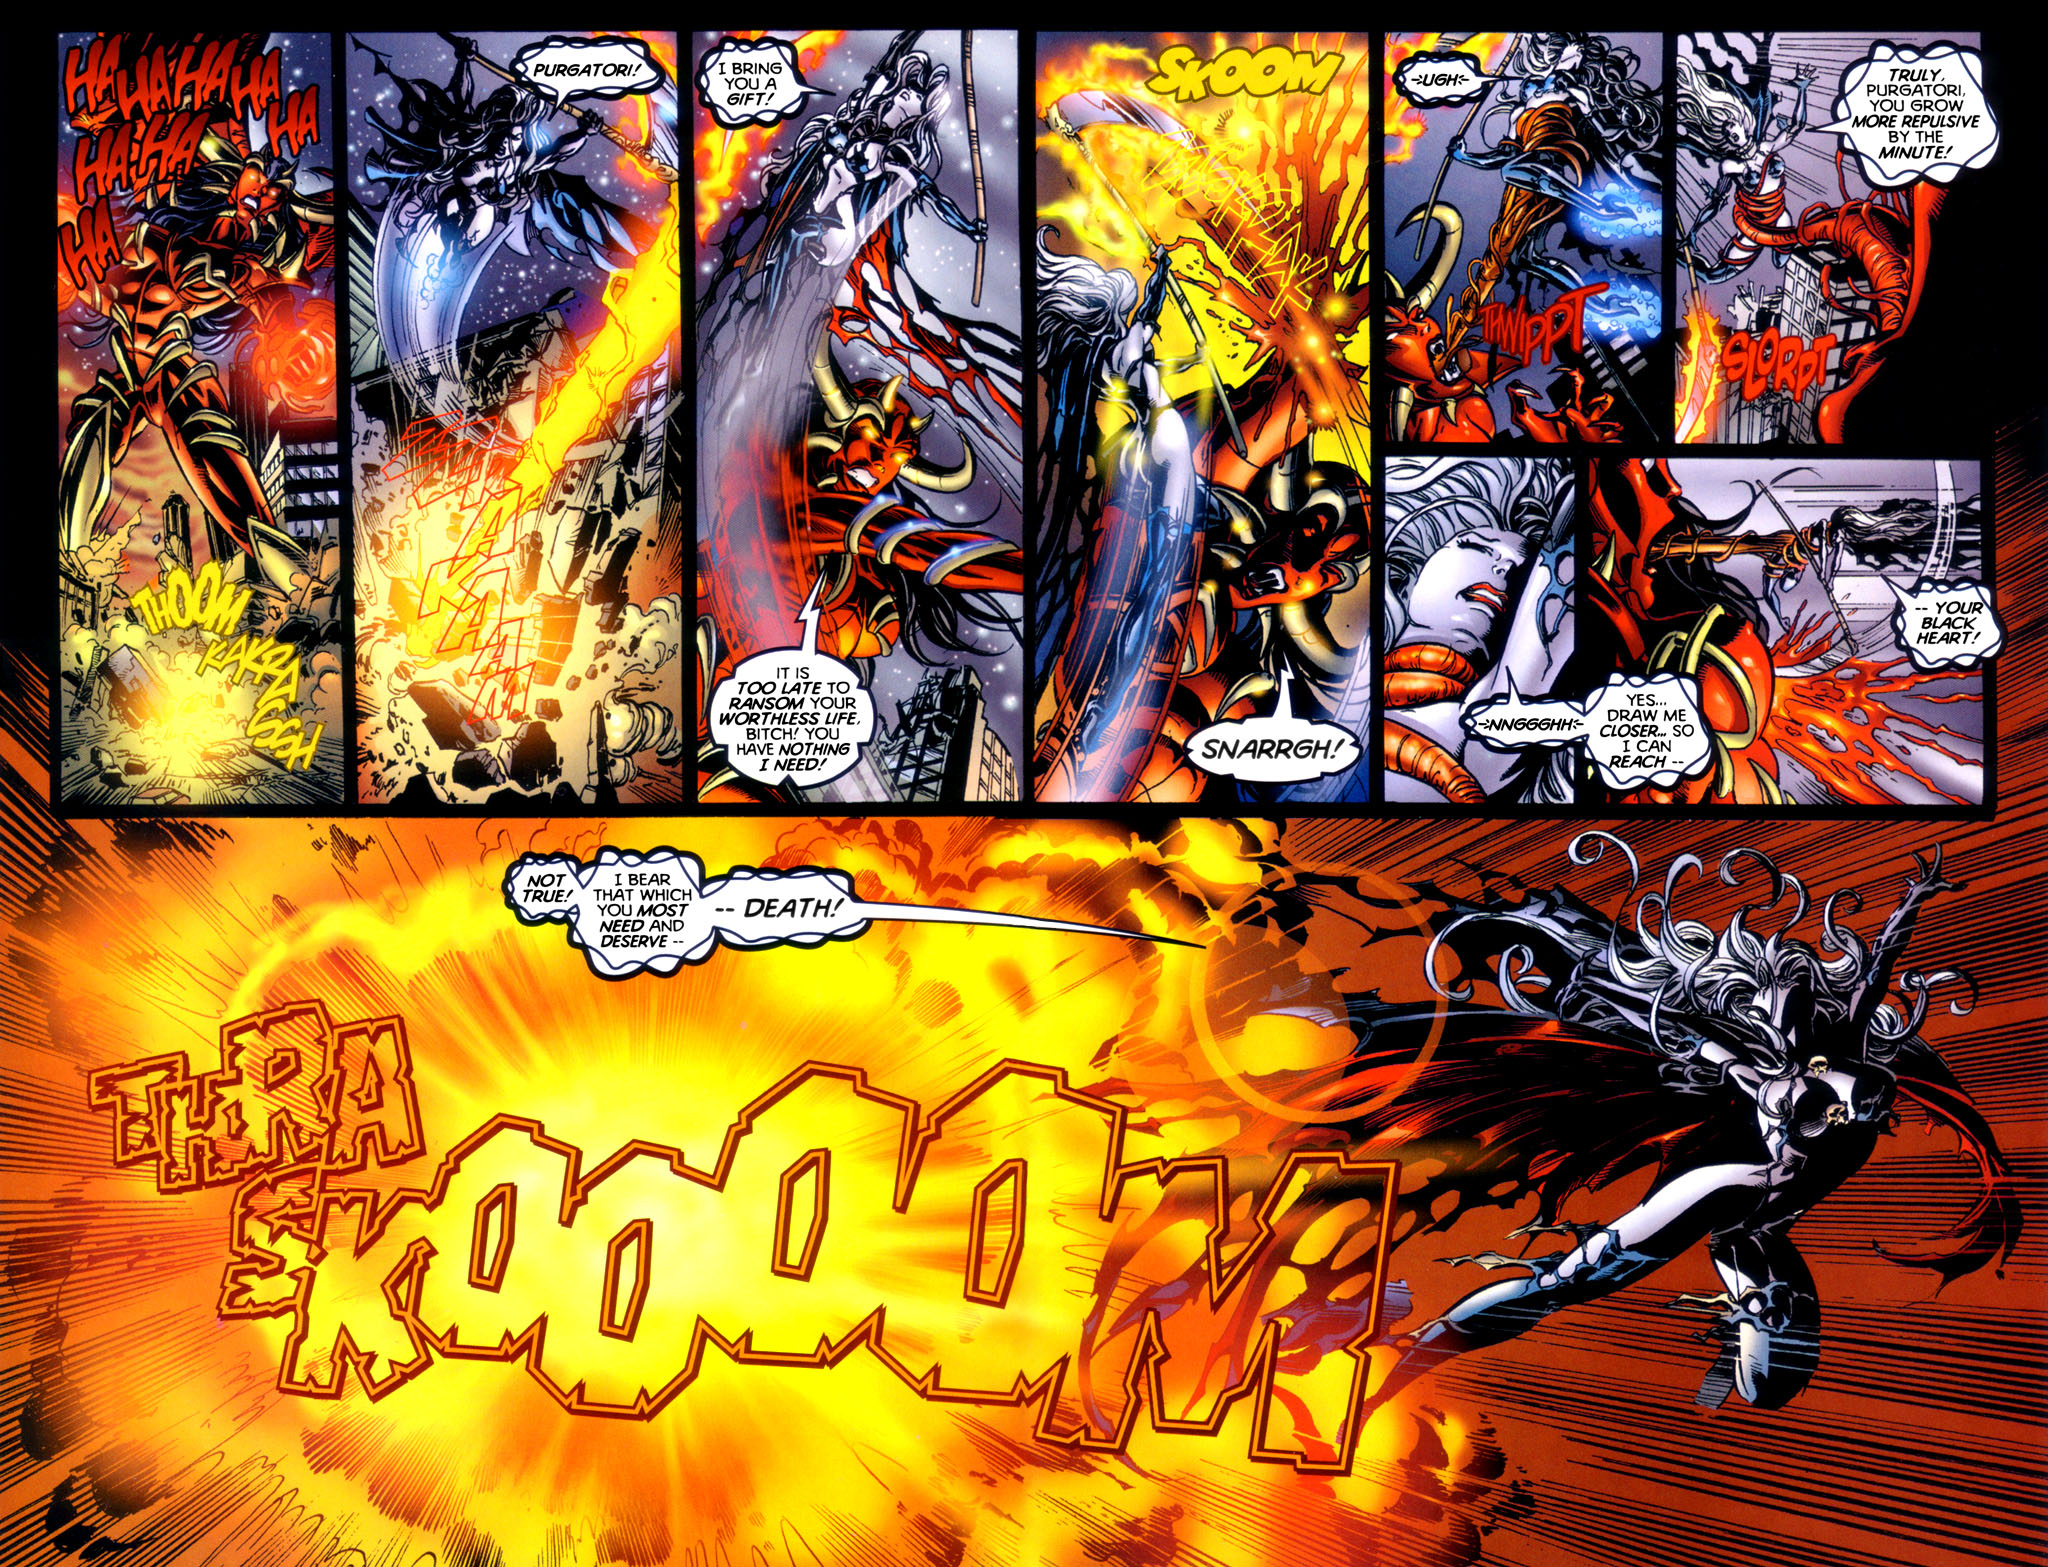 Read online Lady Death vs. Purgatori comic -  Issue # Full - 21